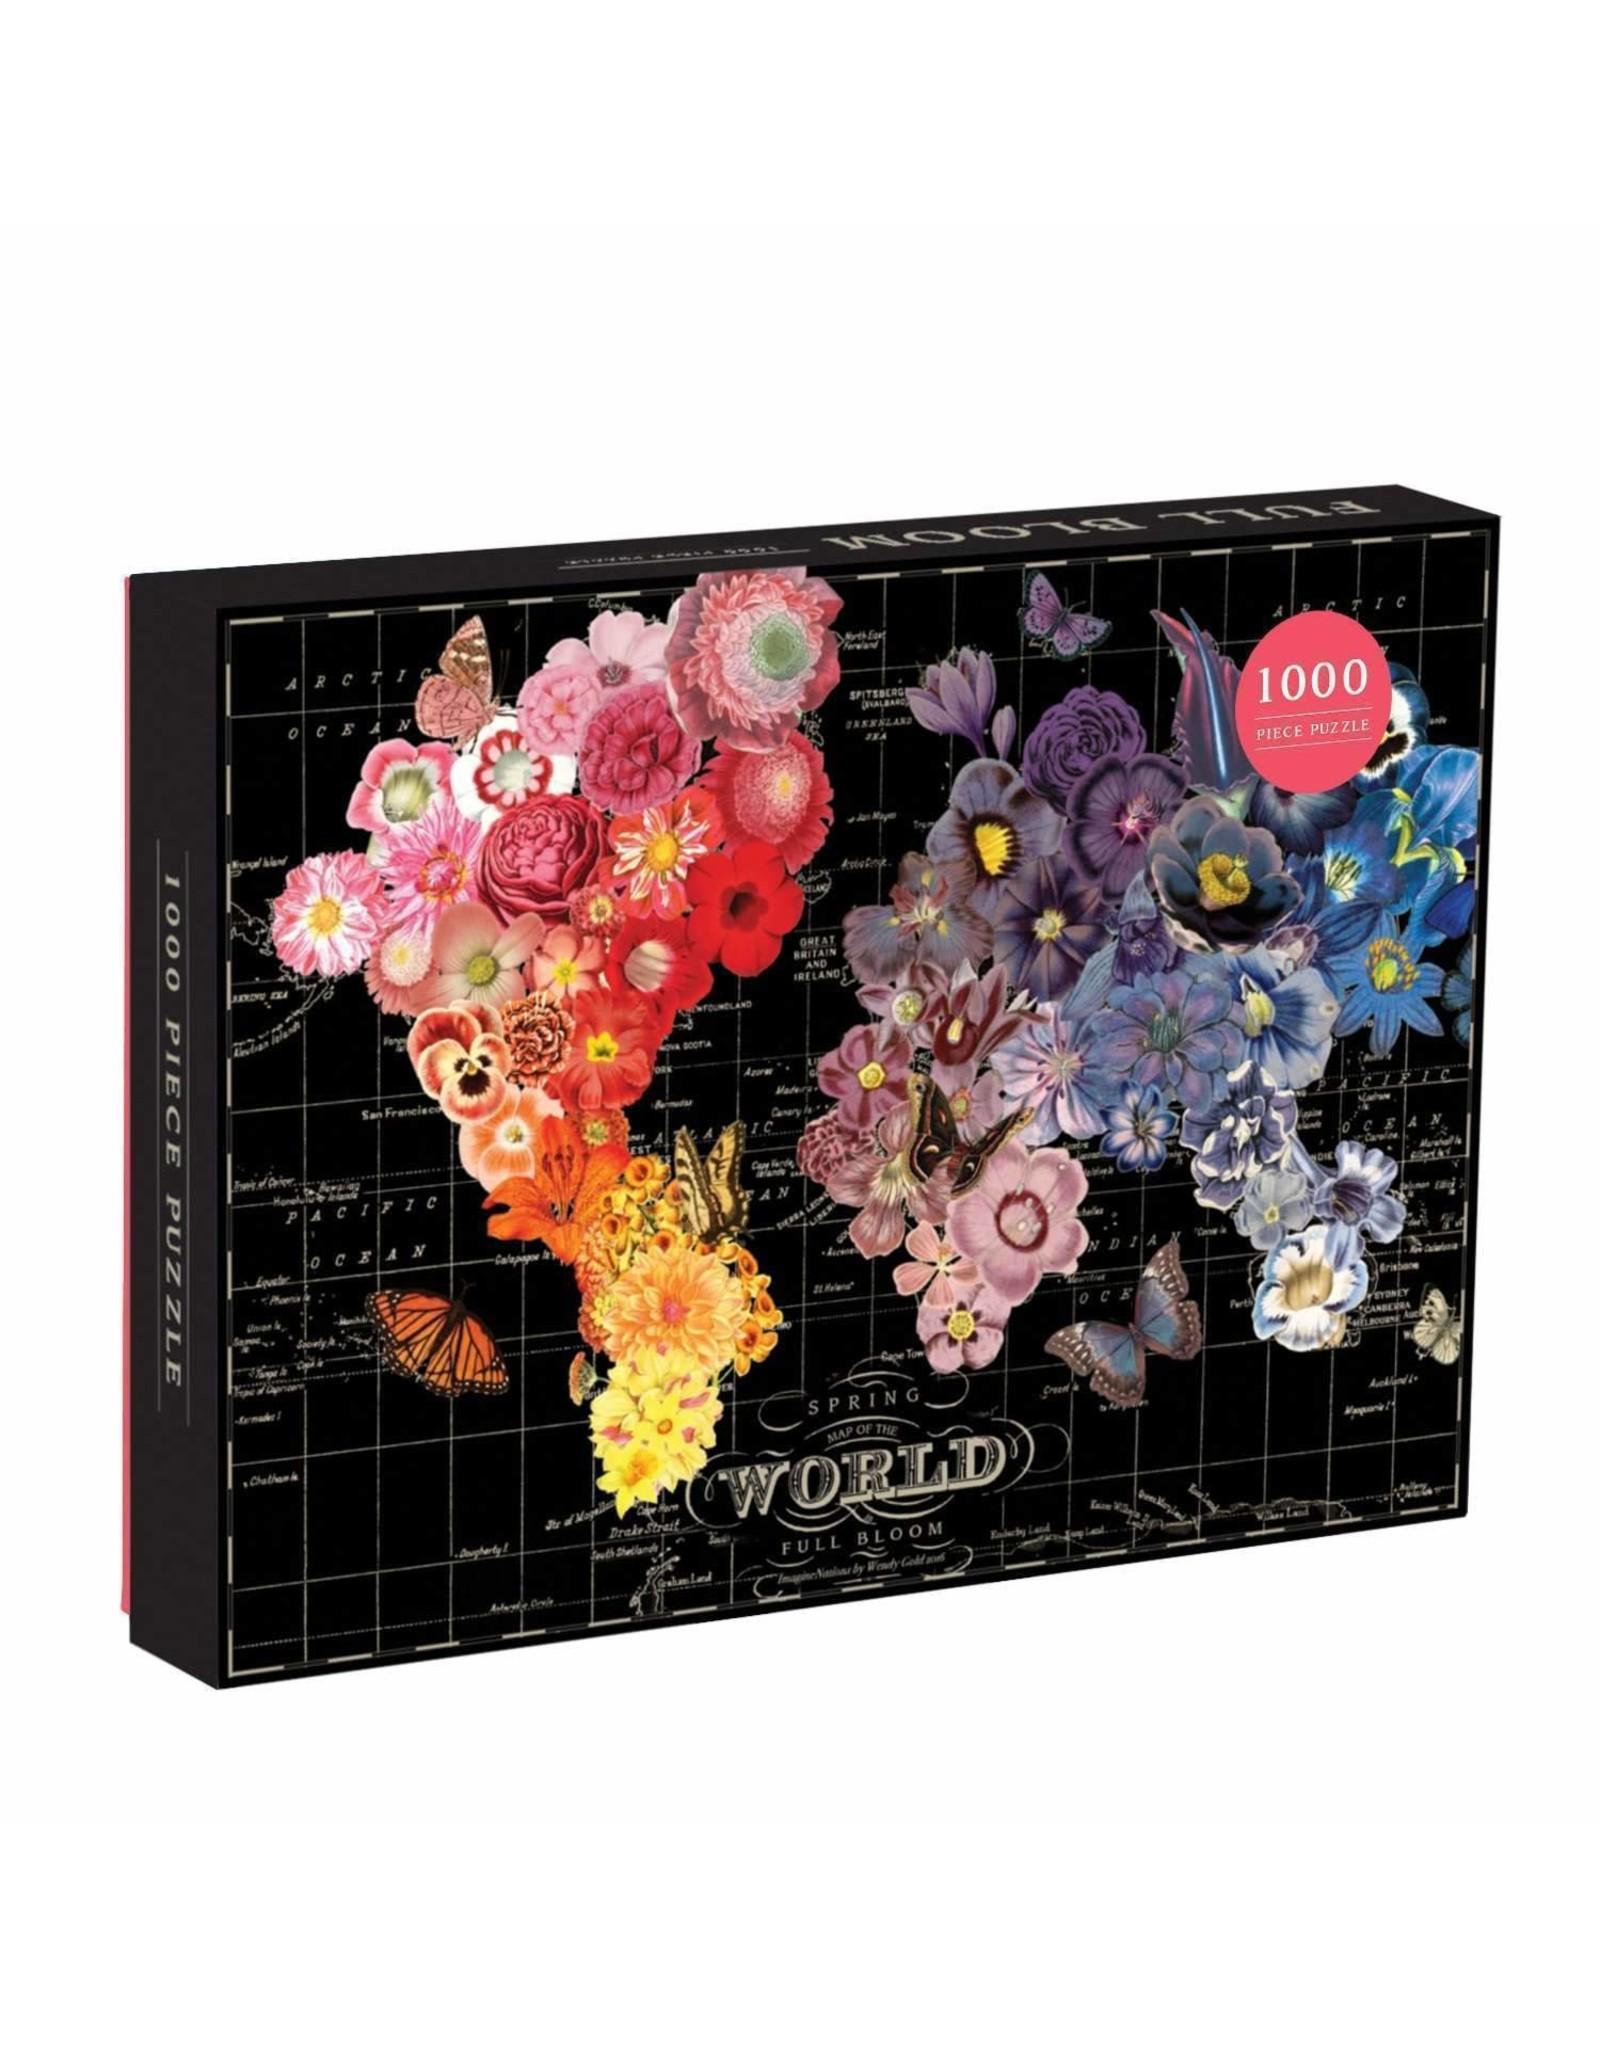 Galison Wendy Gold Full Bloom 1000p